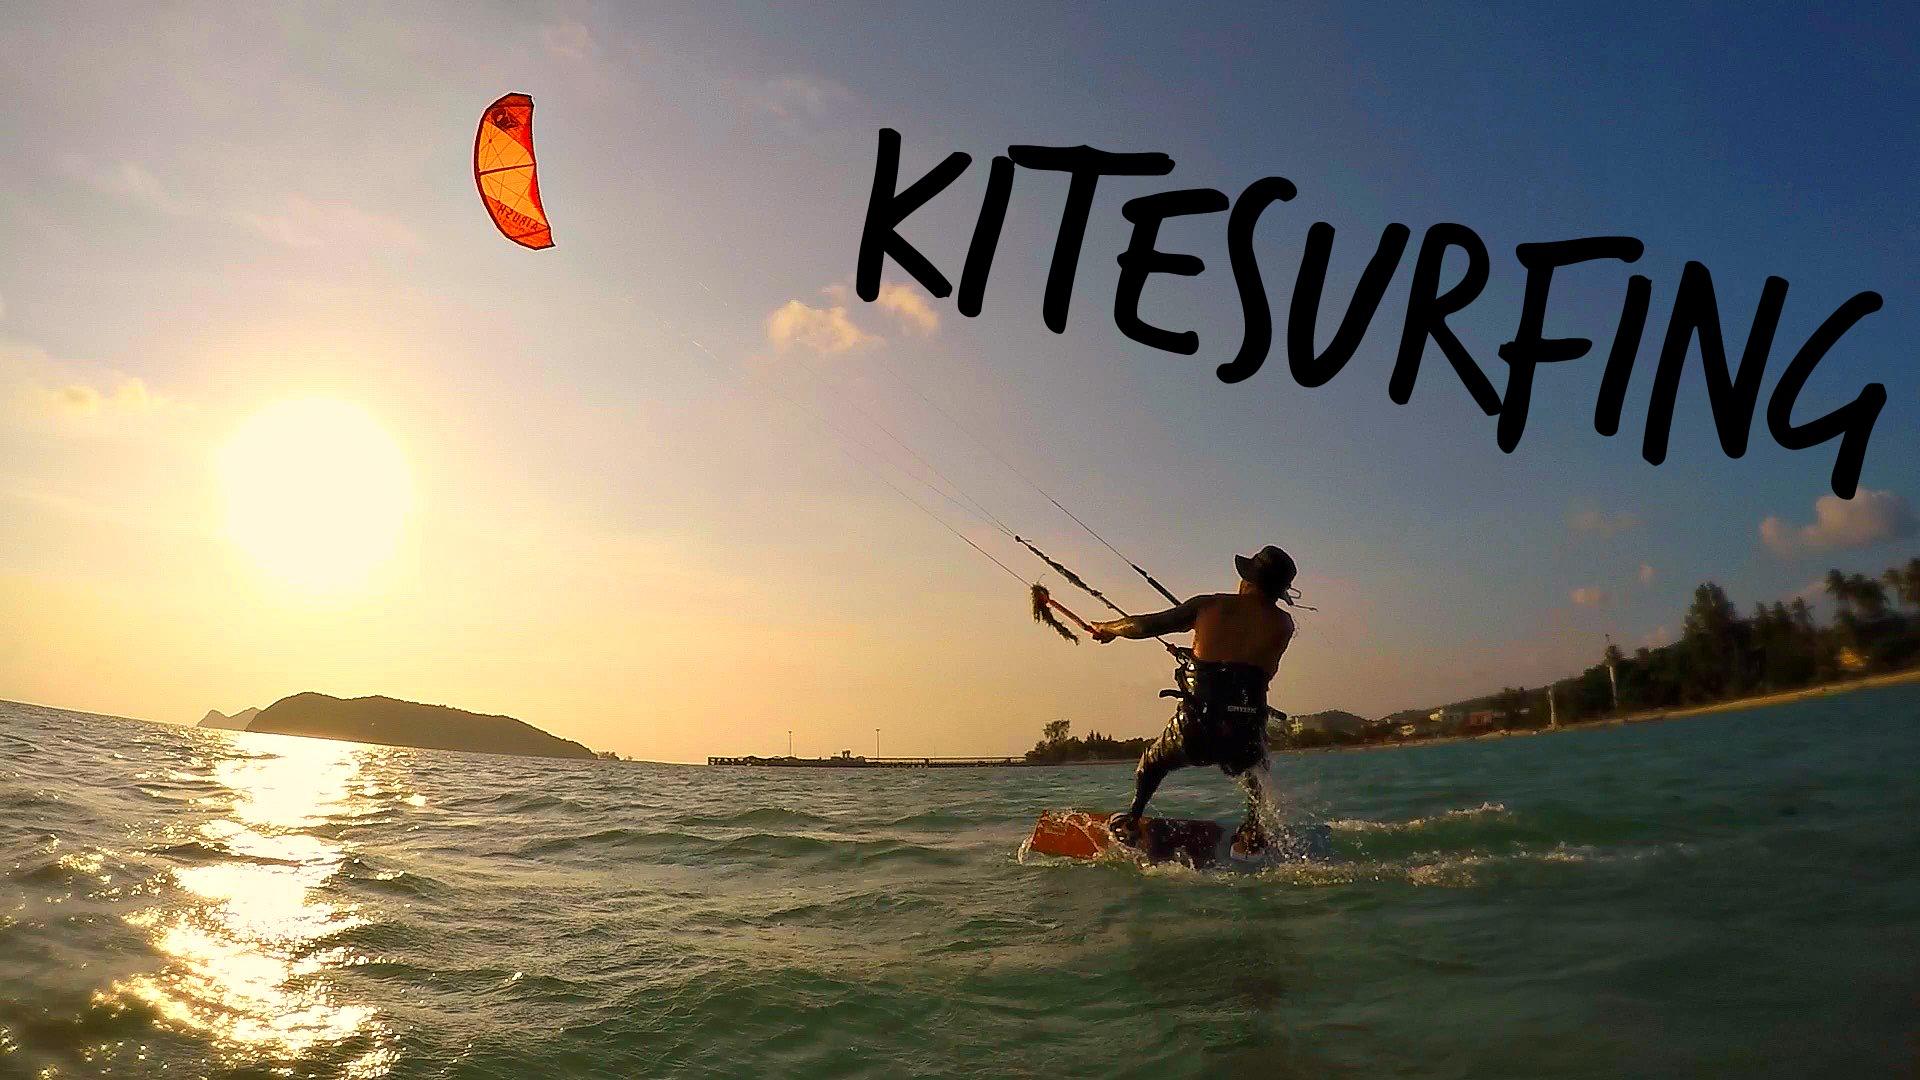 Kitesurfing Gallery.jpg